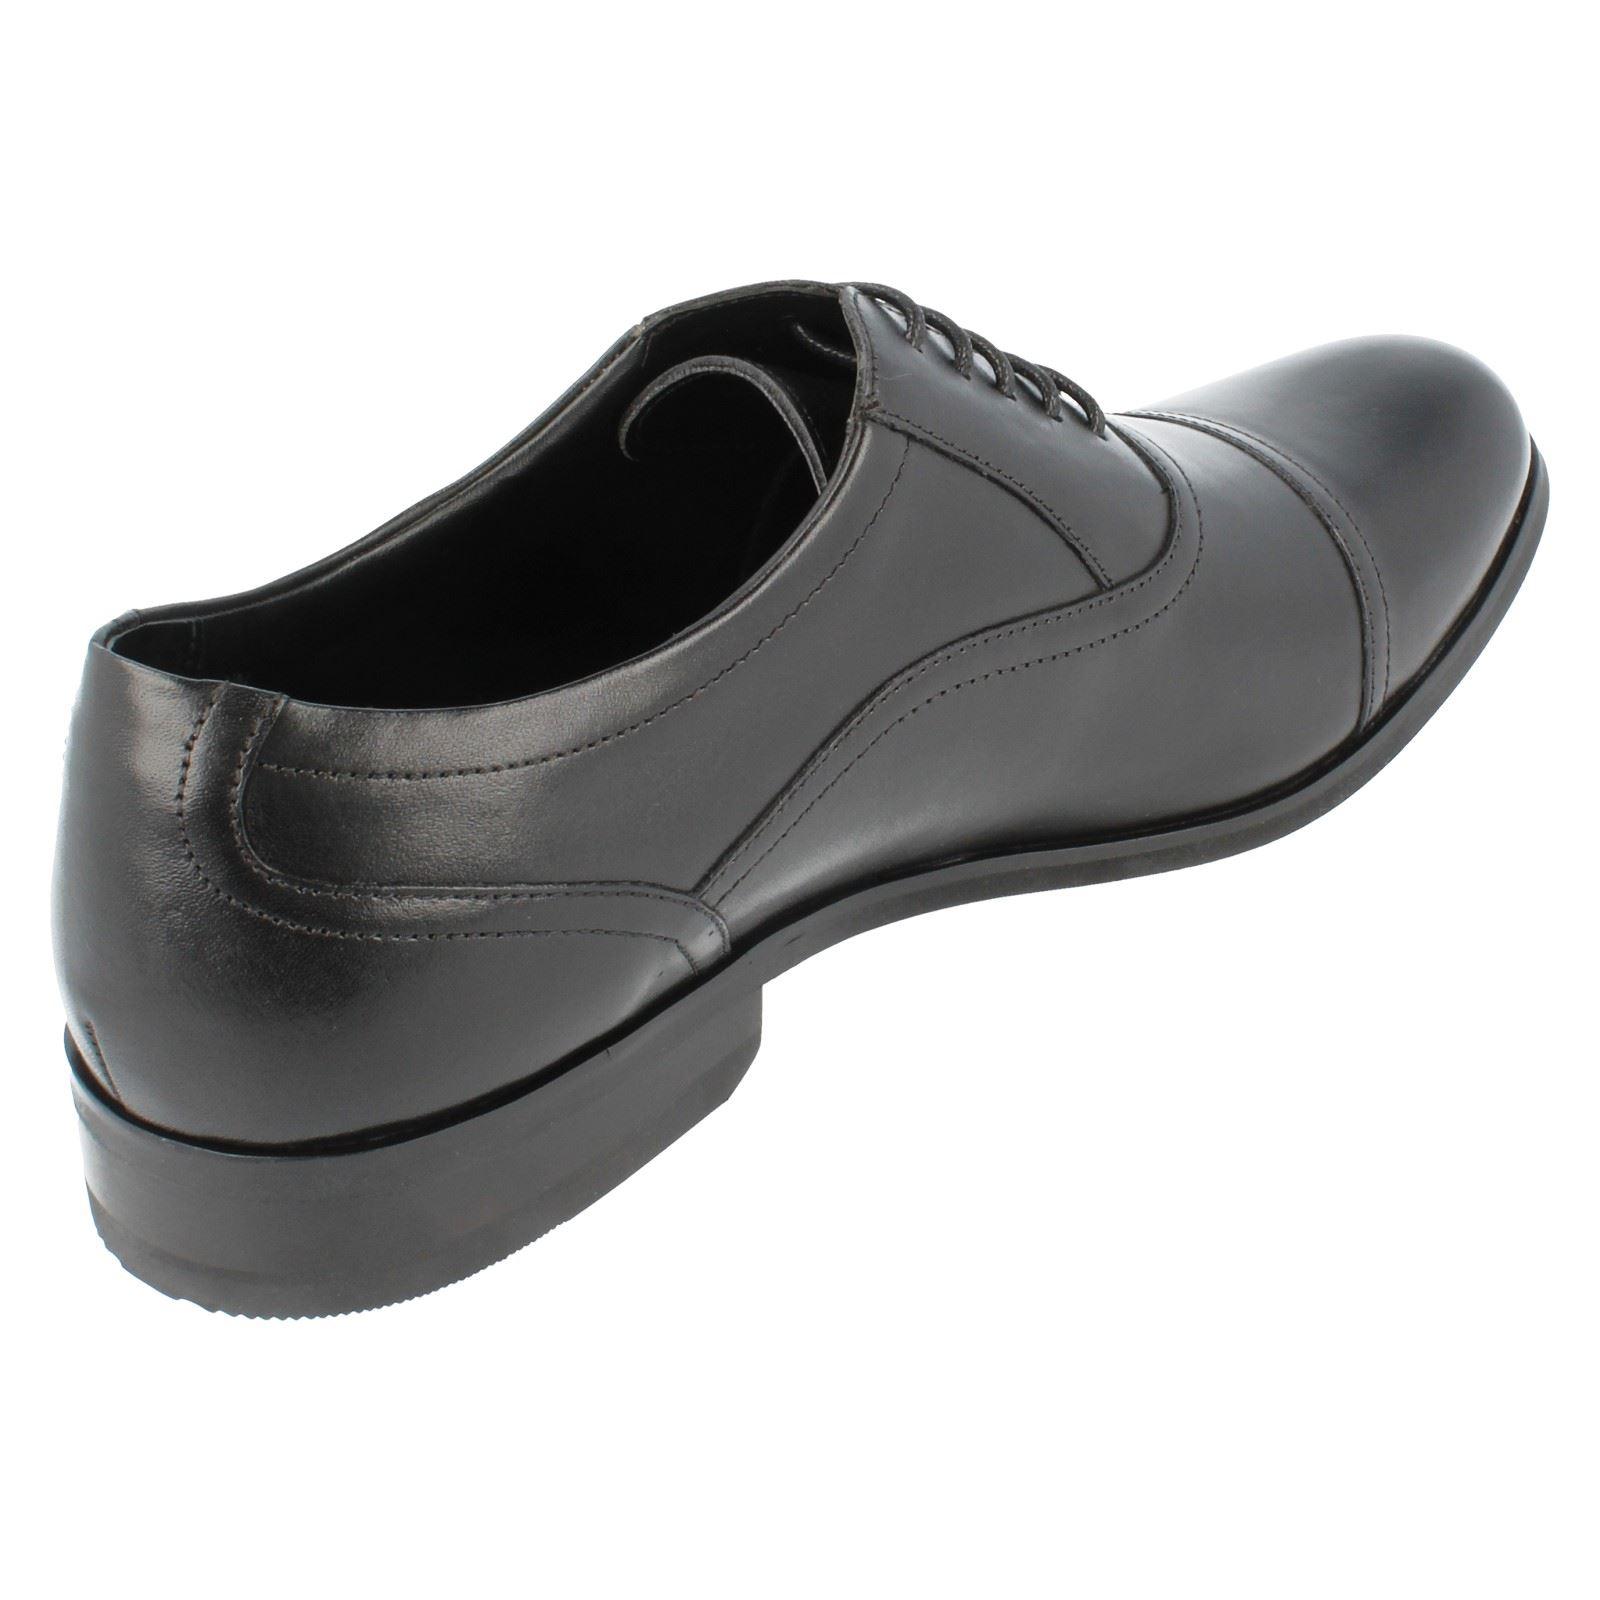 Herren Clarks Lace Up Schuhes Style Brint Cap  N f1152d